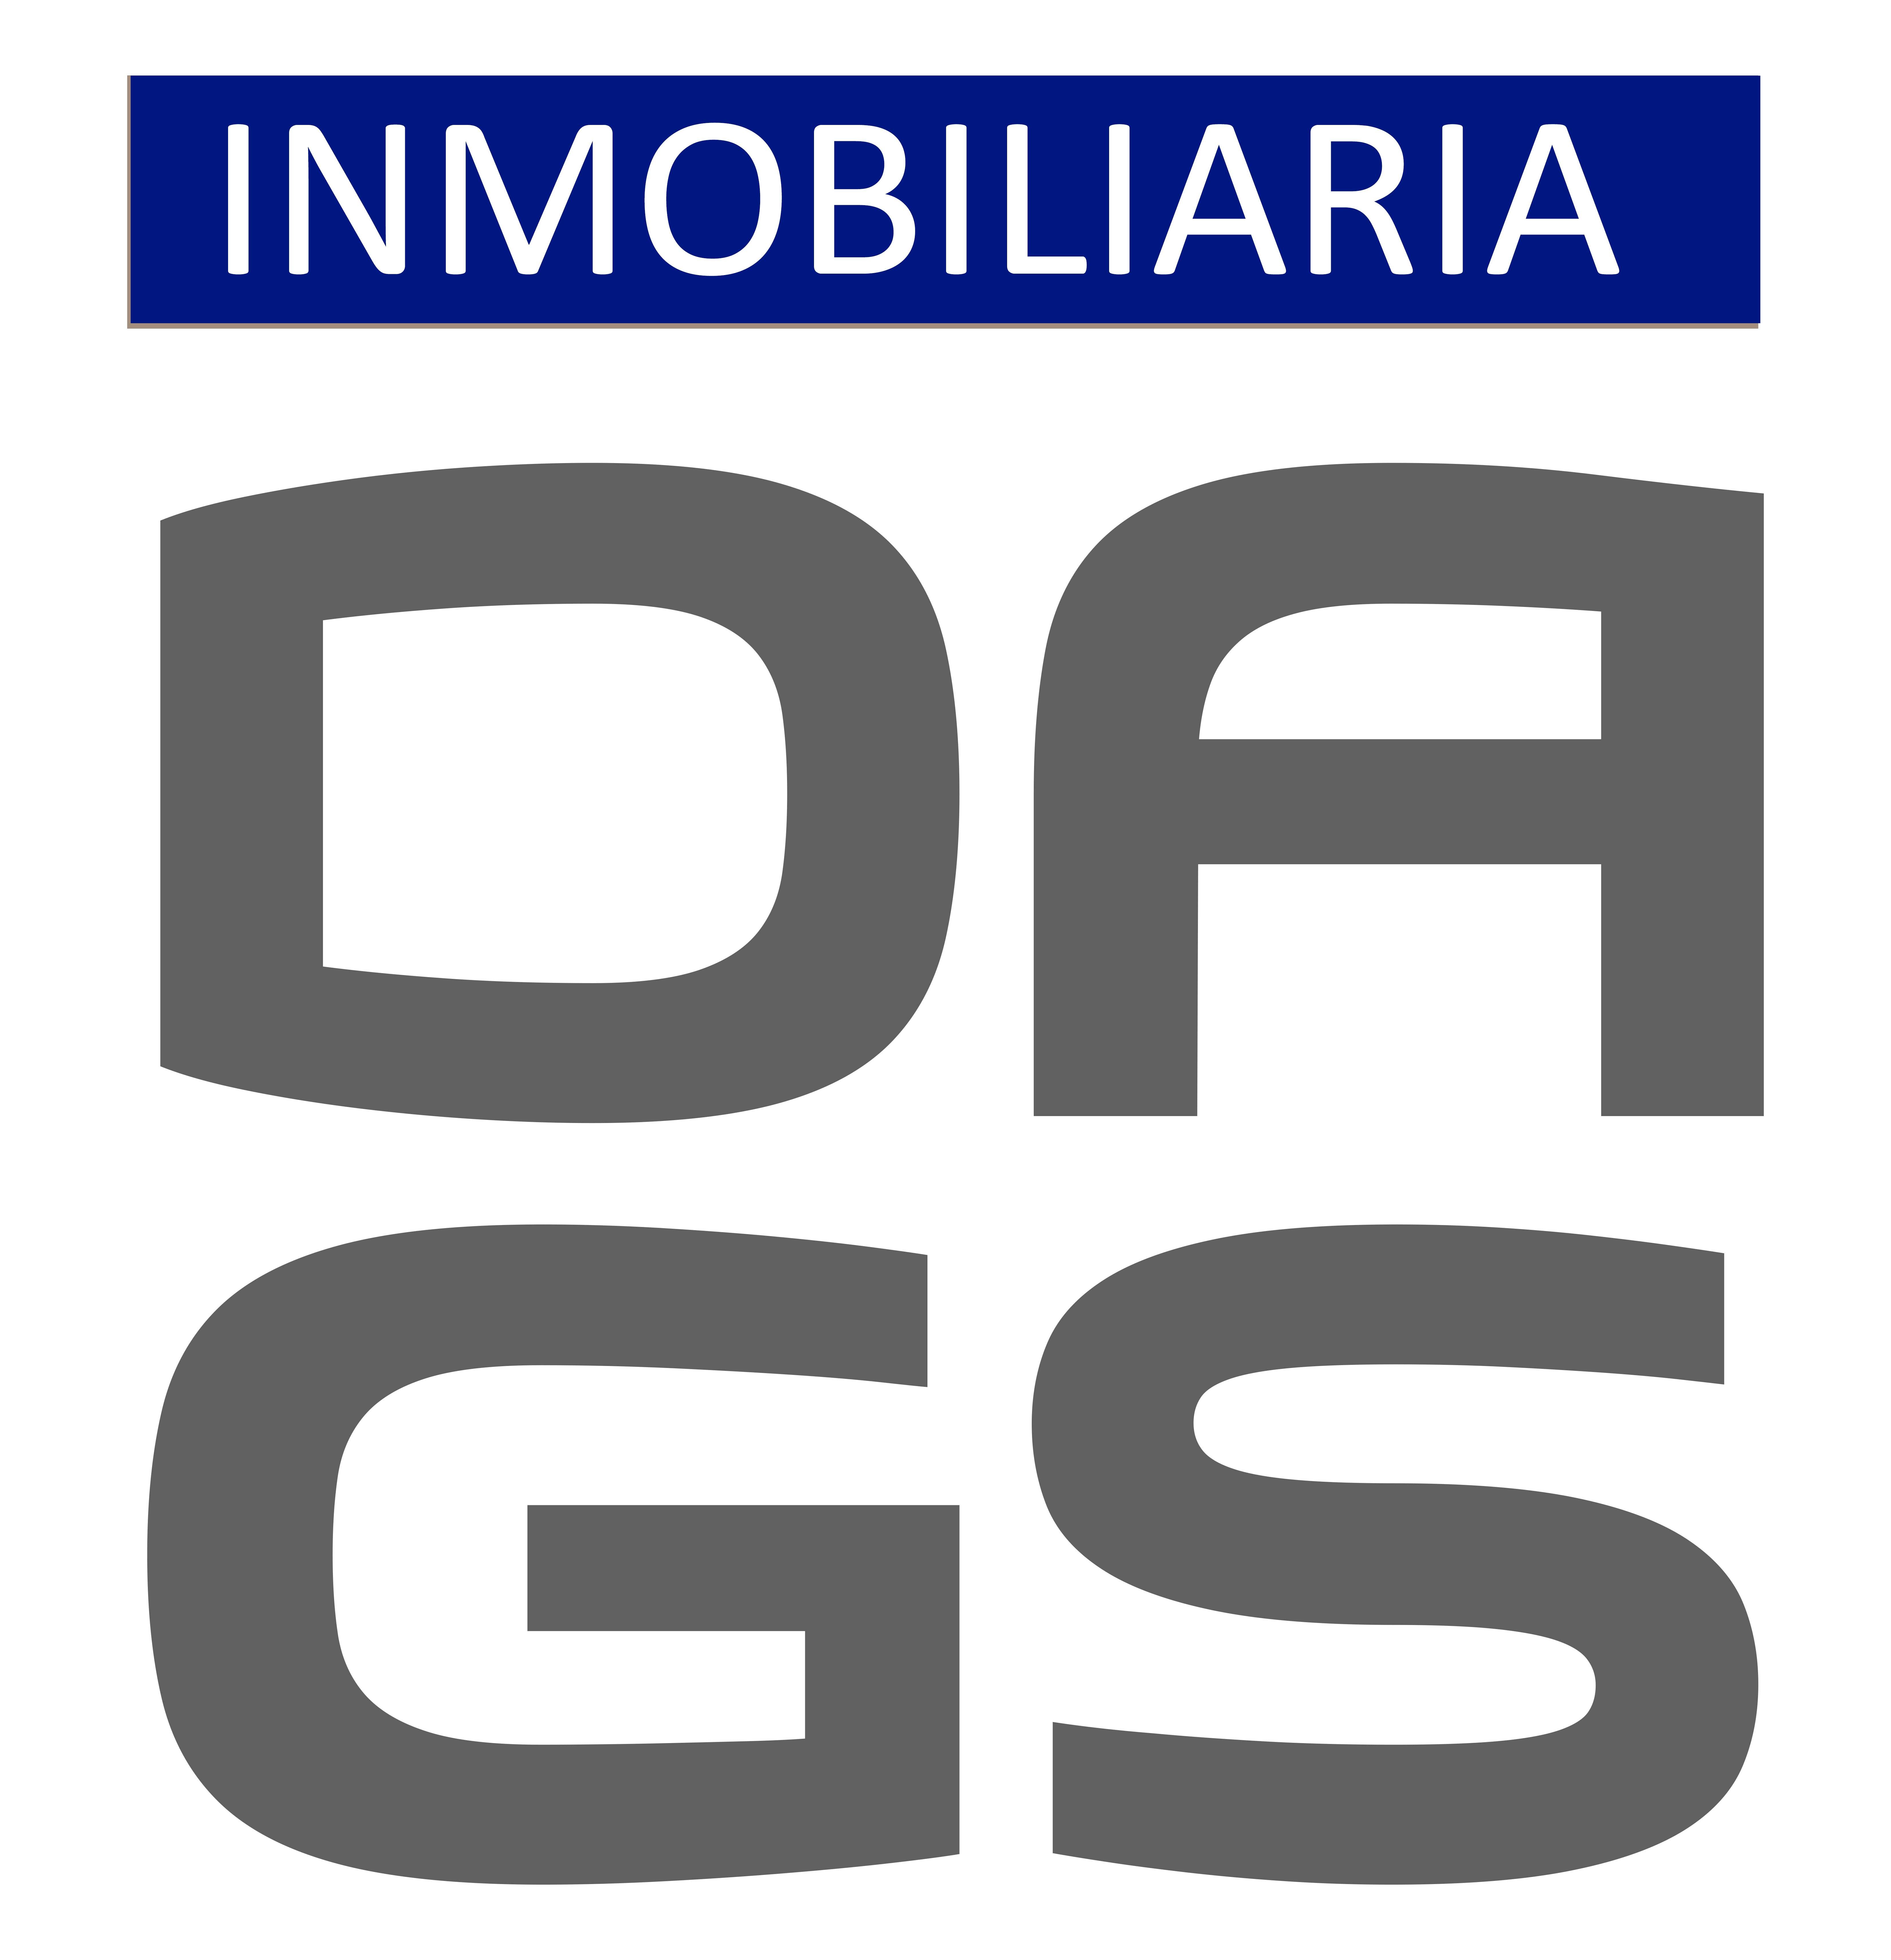 INMOBILIARIA_DAGS.jpg